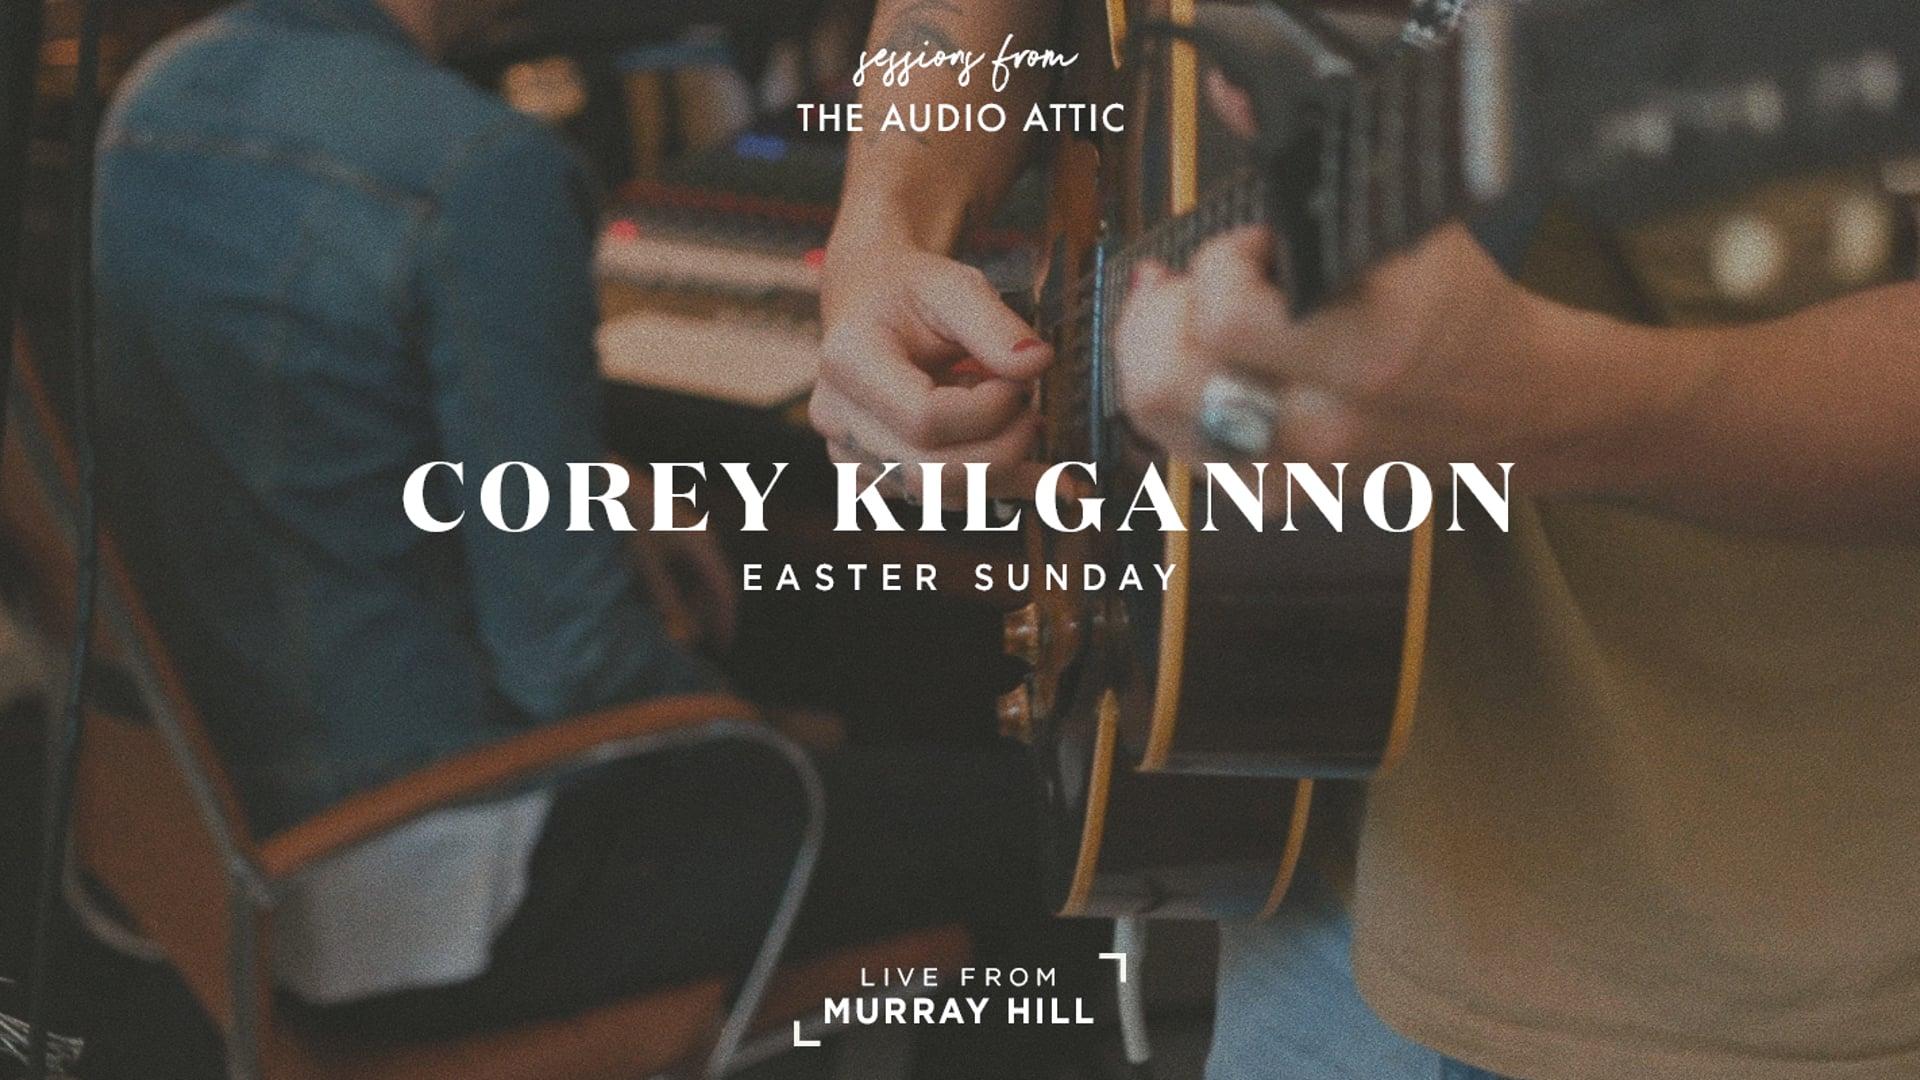 The Audio Attic Sessions - Corey Kilgannon -  Easter Sunday